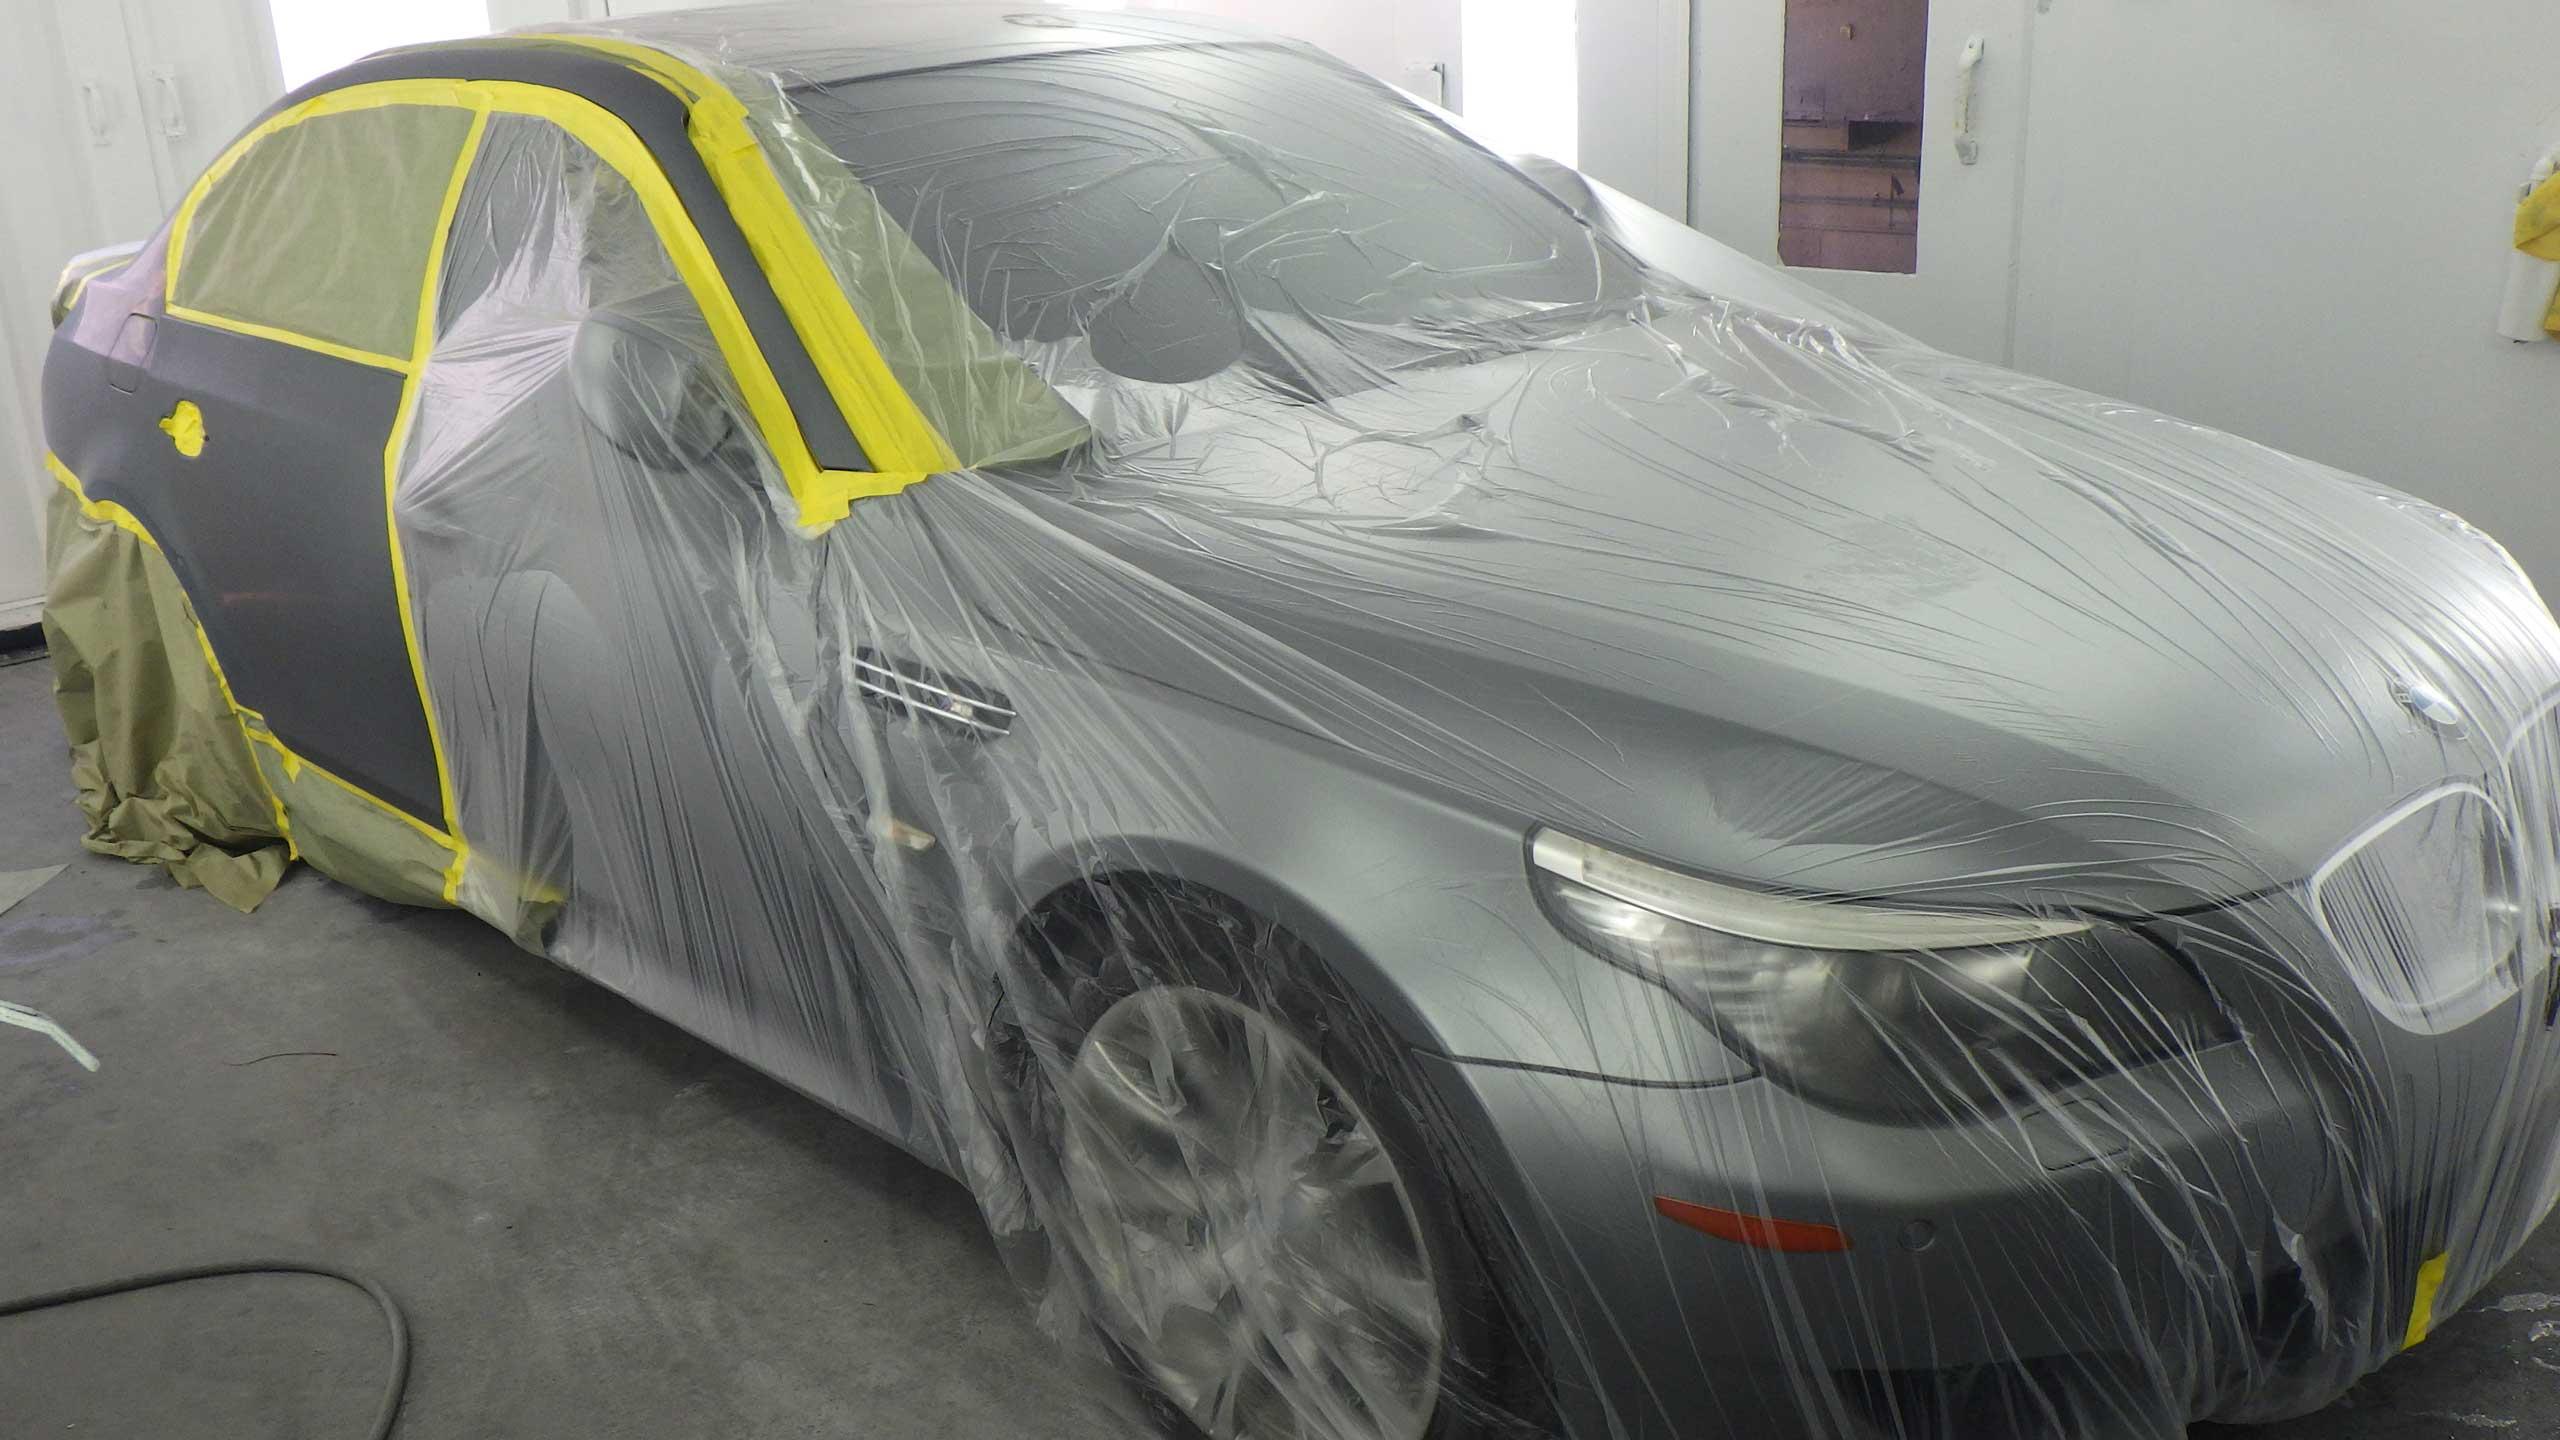 UC_Autobody_Paint_WIP_2560x1440-002